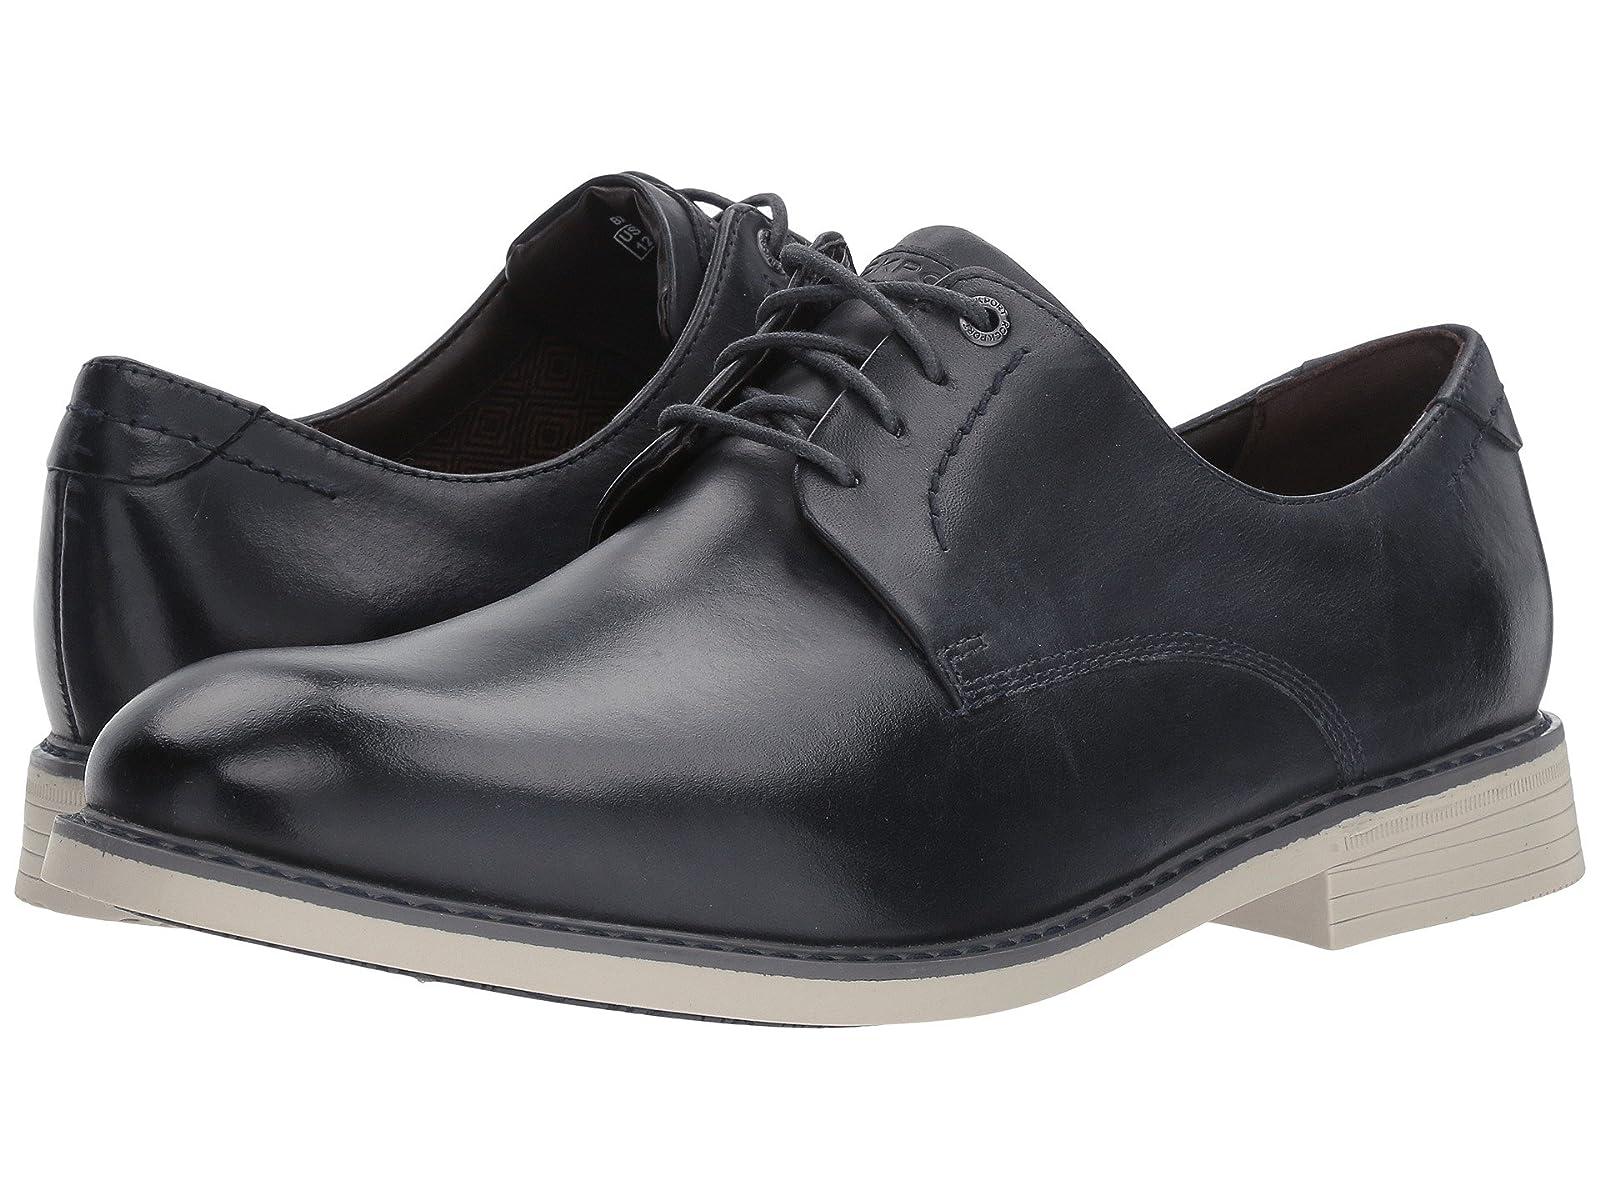 Rockport Classic Break Plain ToeCheap and distinctive eye-catching shoes